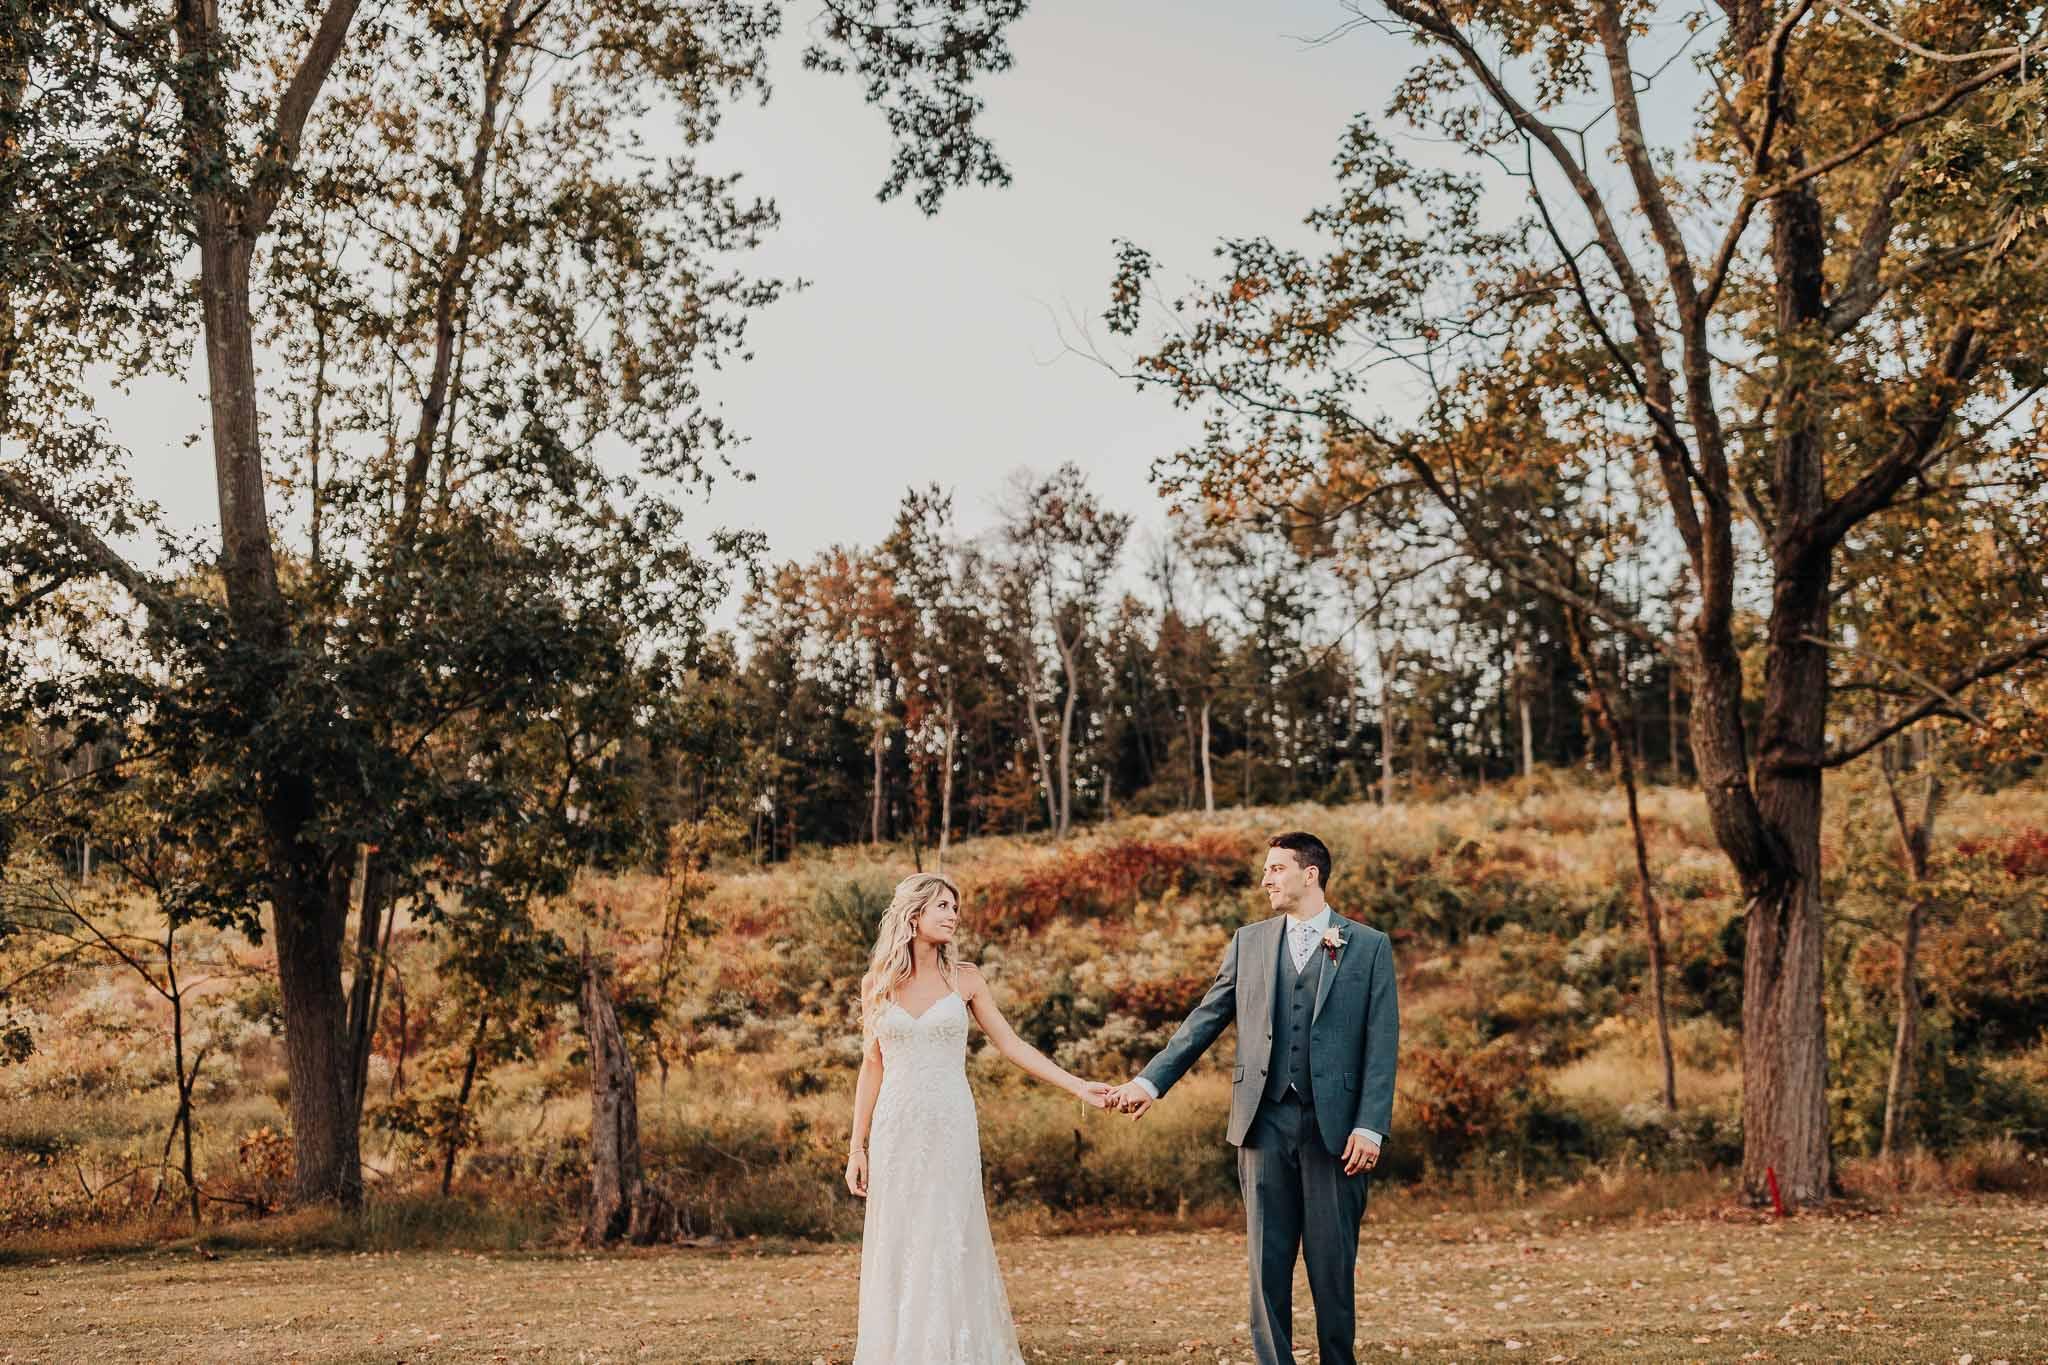 Frosty-Valley-September-Wedding-8197.jpg